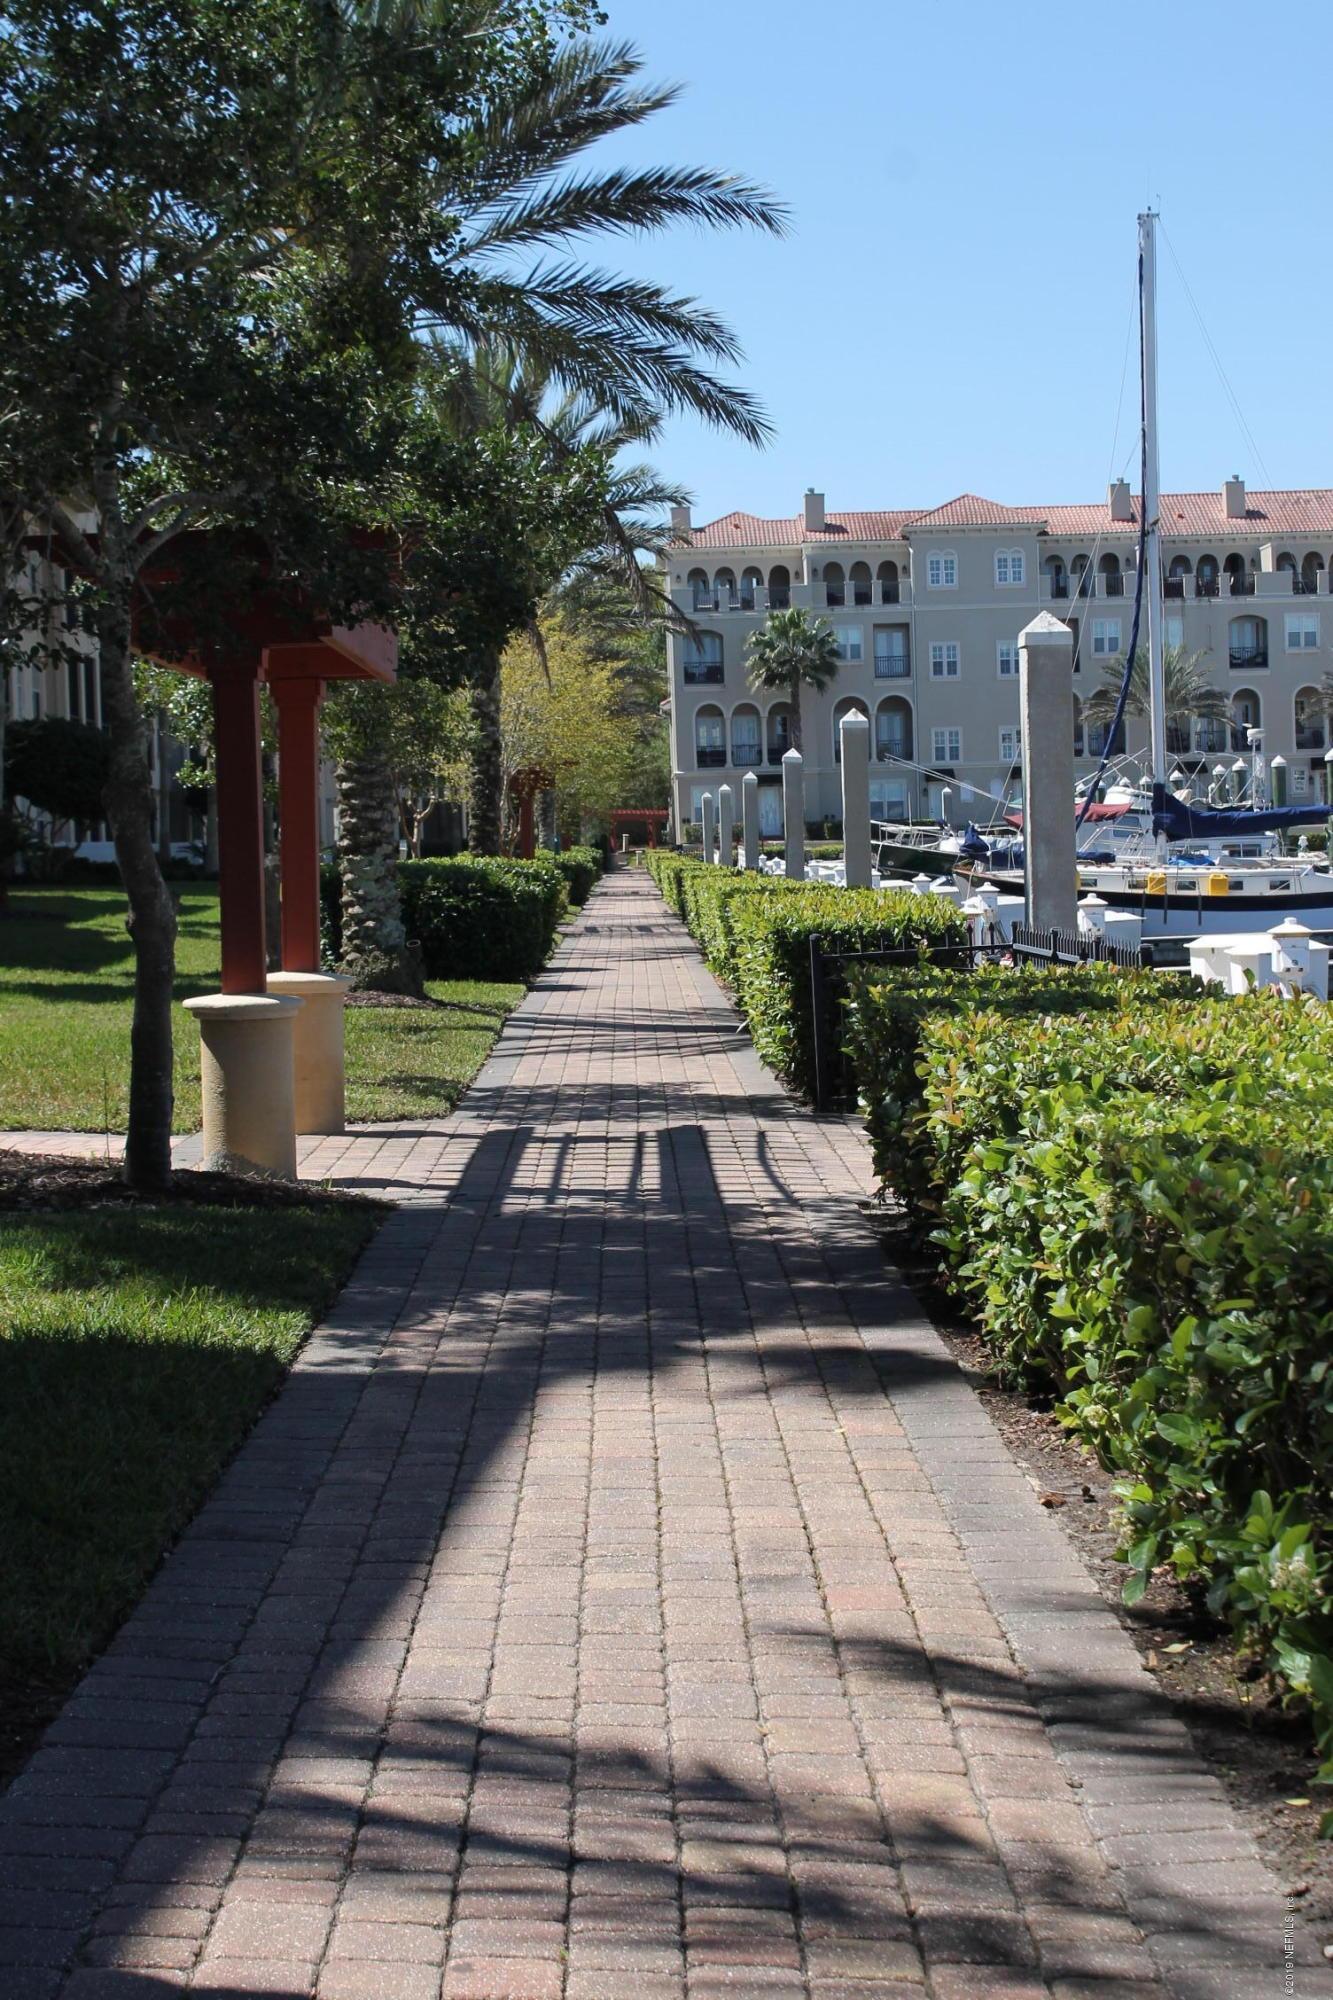 0 ATLANTIC, JACKSONVILLE, FLORIDA 32225, 1 Bedroom Bedrooms, ,1 BathroomBathrooms,Condo,For sale,ATLANTIC,990936